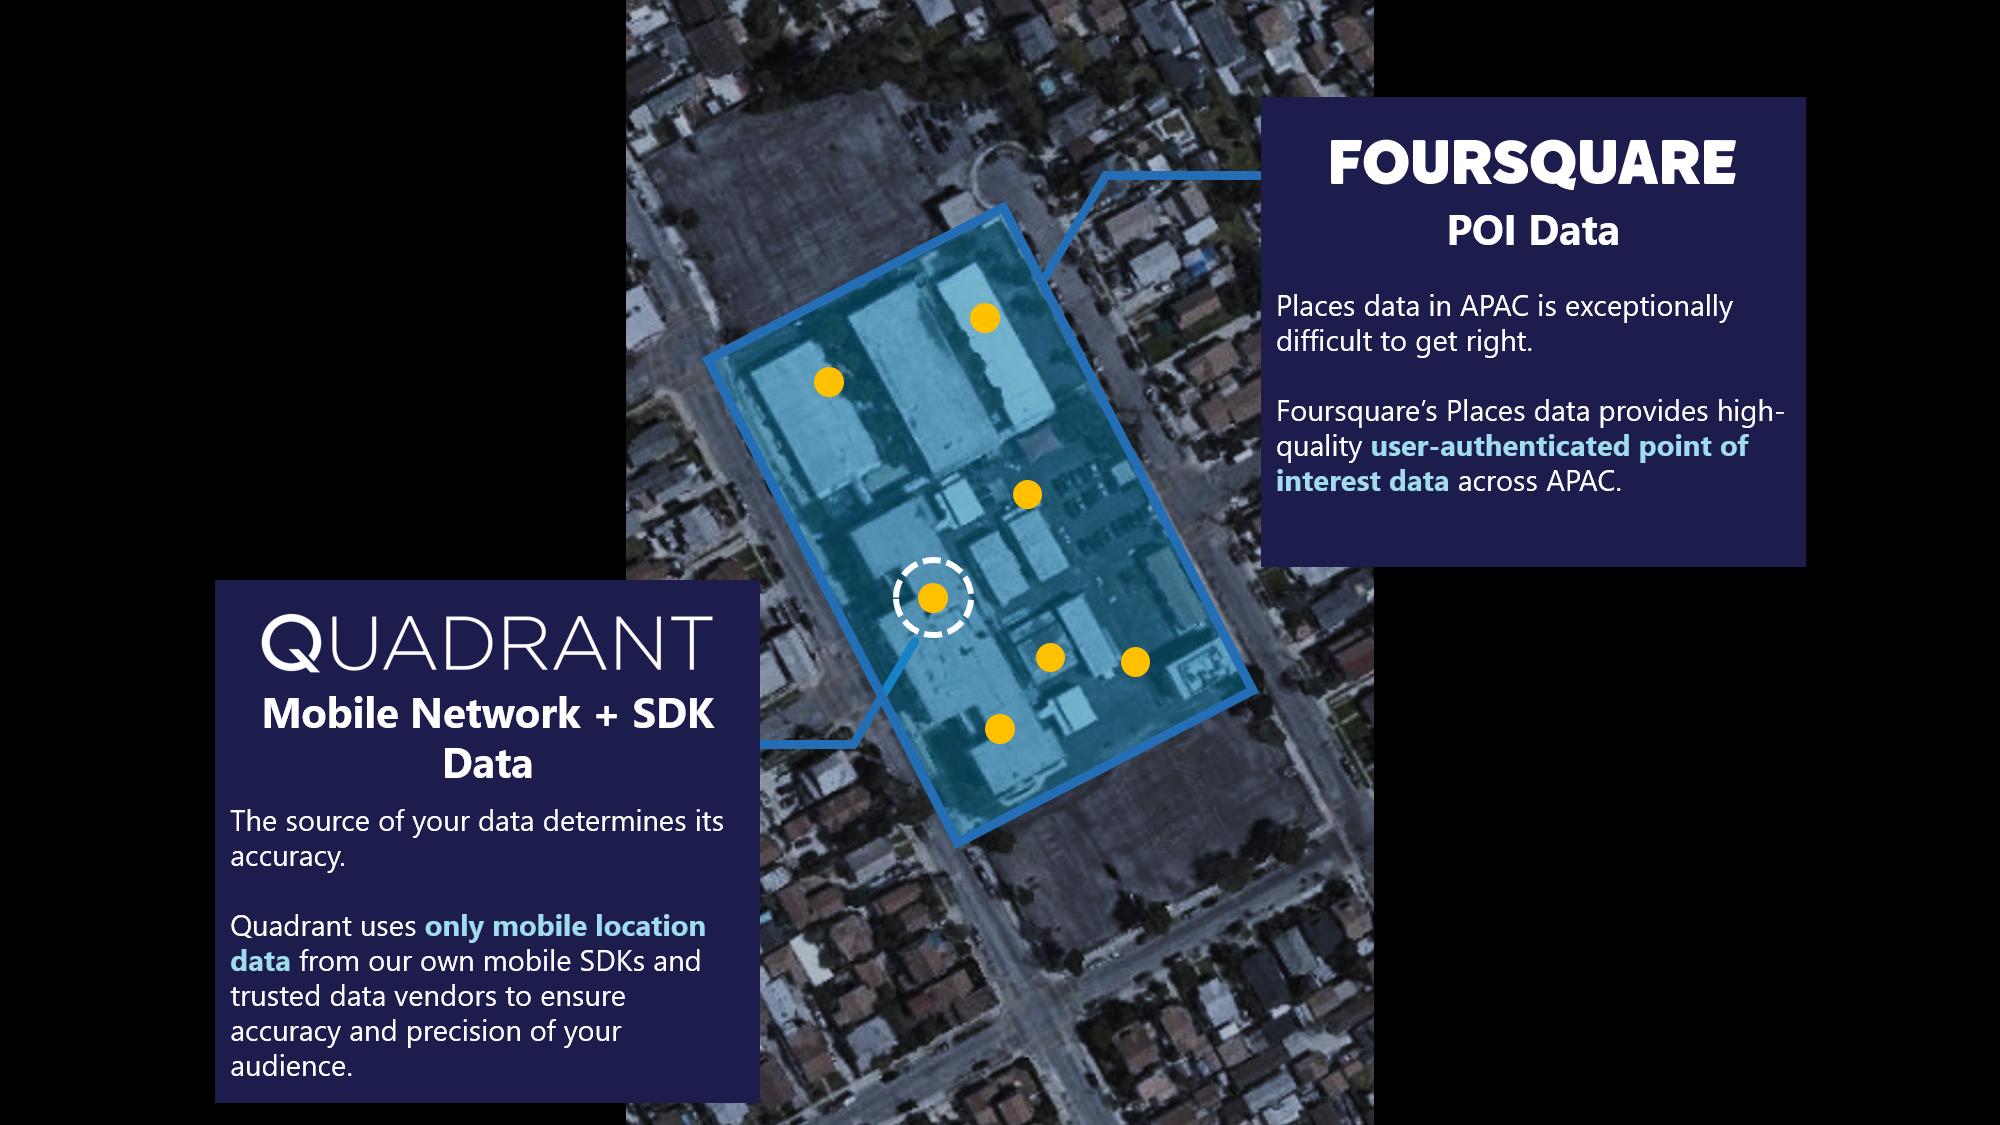 Foursquare places database and Quadrant mobile location data